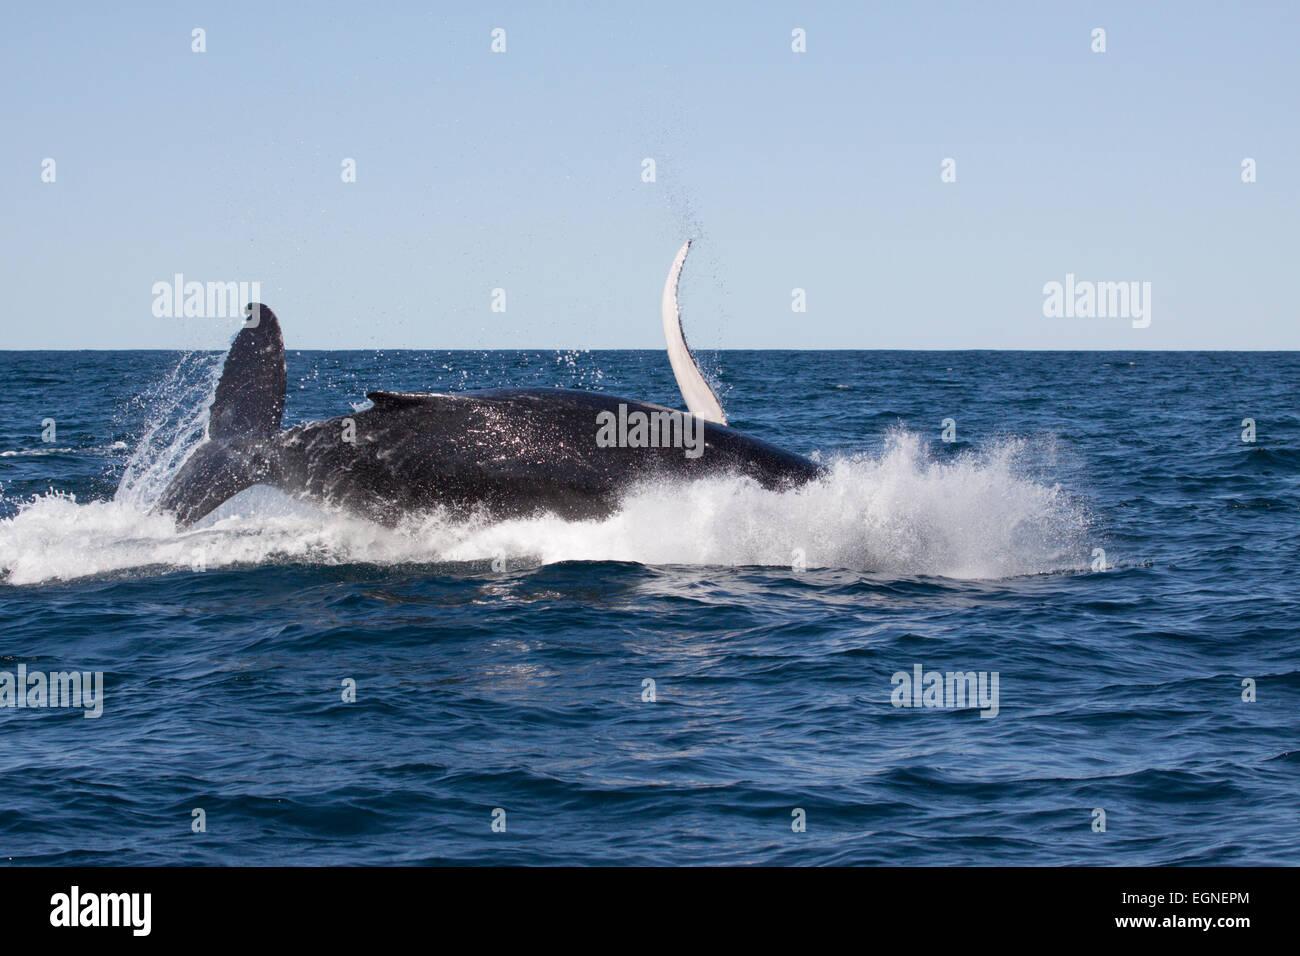 Humpback Whale (Megaptera novaeangliae) in Byron Bay, New South Whales, Australia - Stock Image